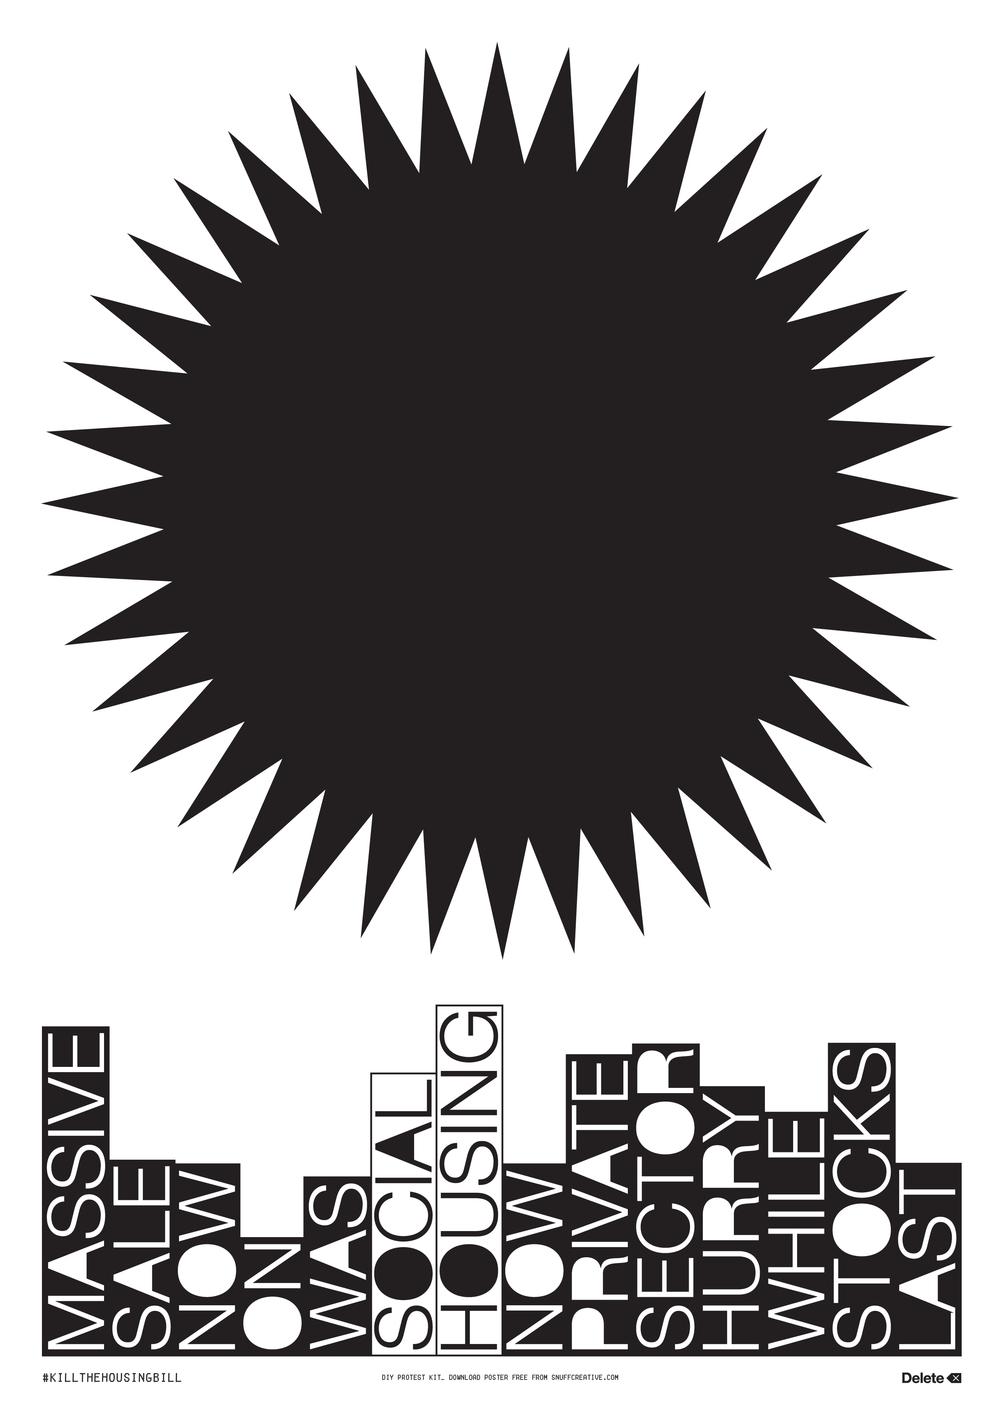 MASSIVE SALE TYPE POSTER_BLACK-02.jpg